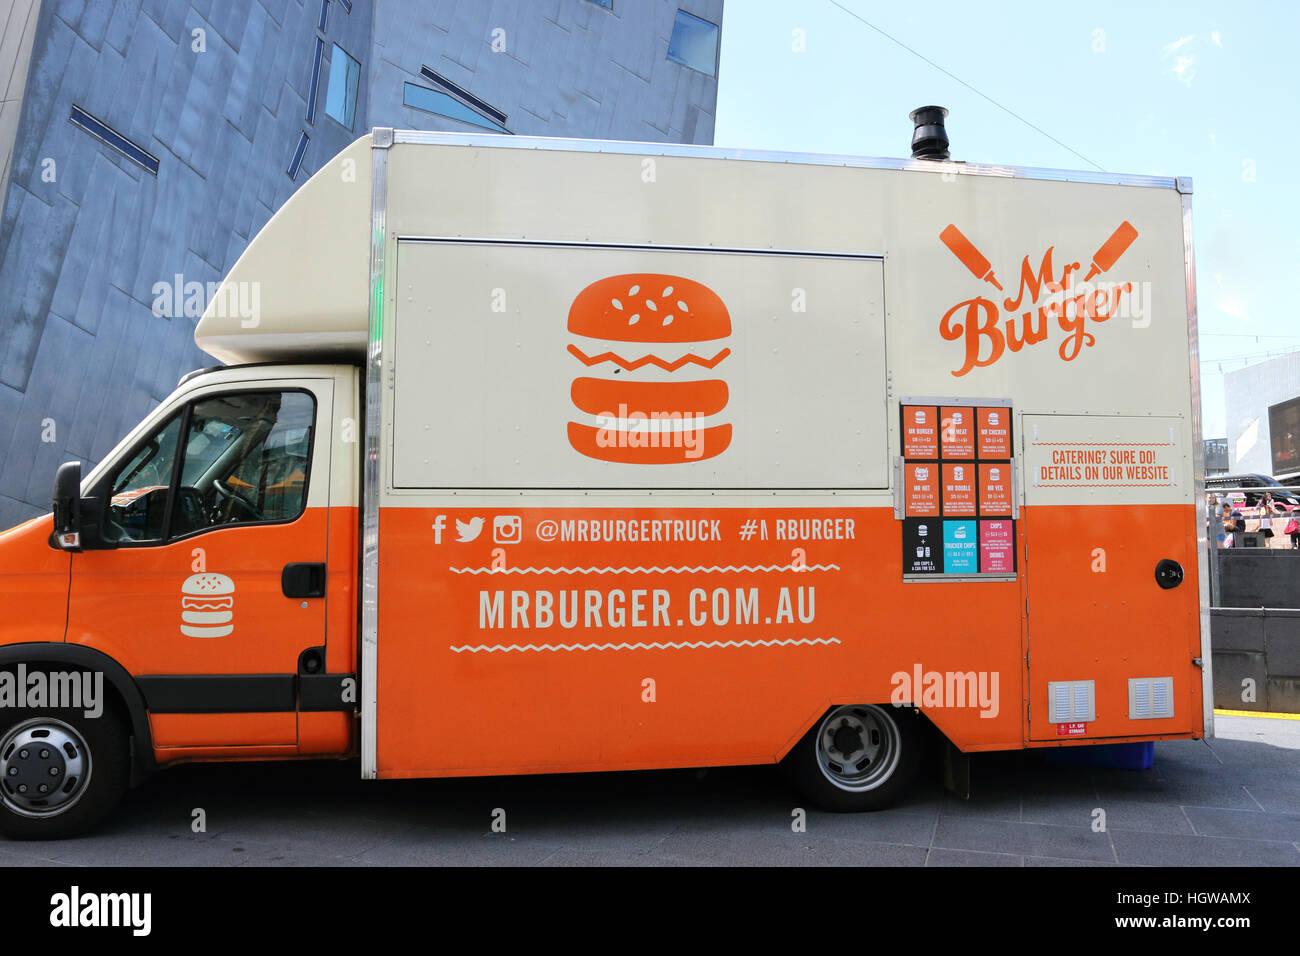 Mr Burger Food Truck In Front Of Federation Square Melbourne CBD Victoria Australia